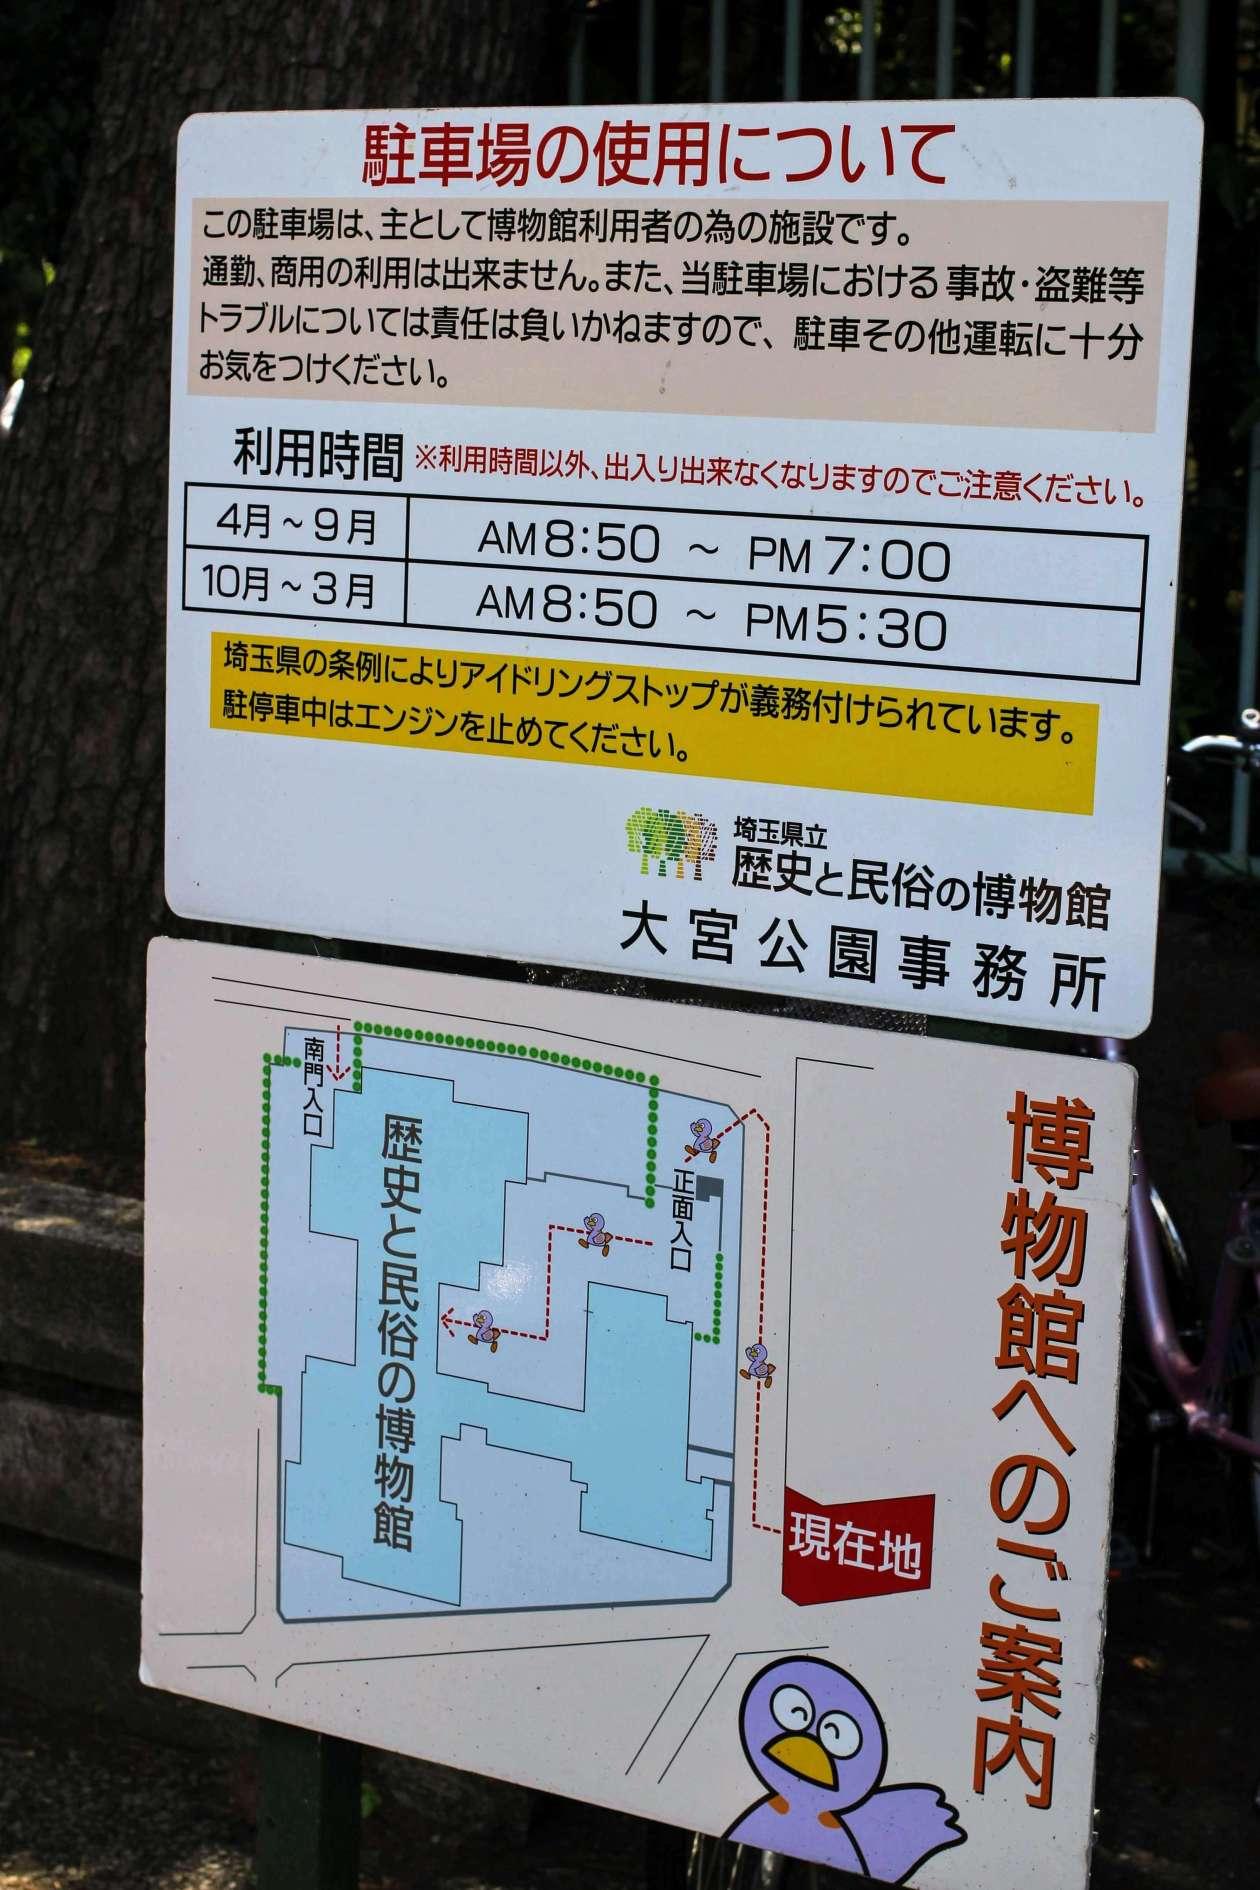 Japanese armor event parking information